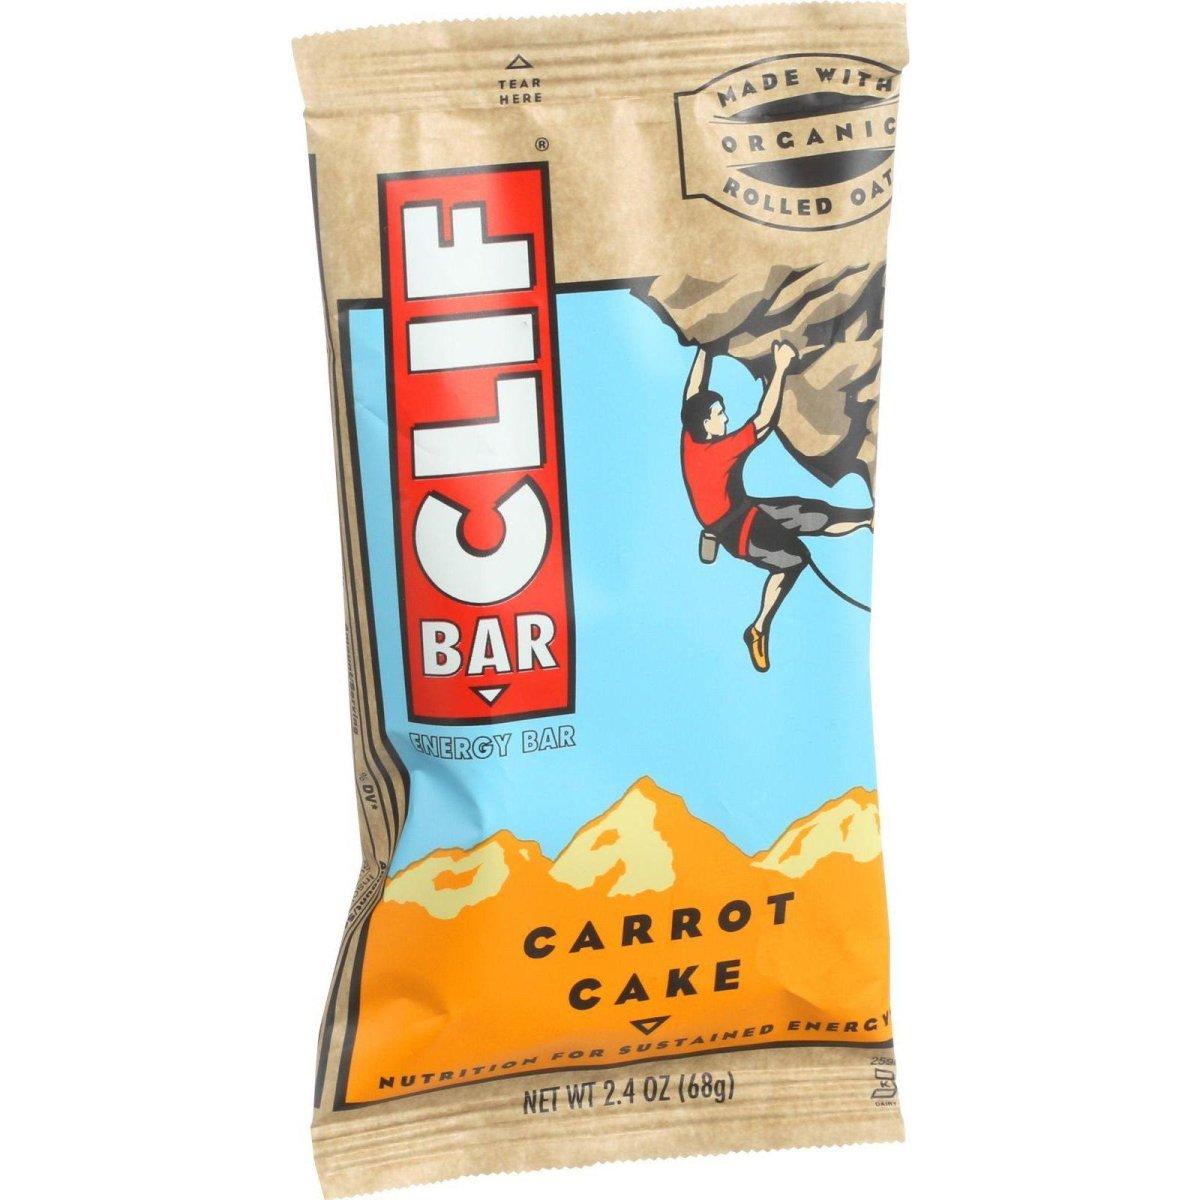 Clif Bar HG0613943 2.4 oz Carrot Cake Organic Energy Bar - Case of 12